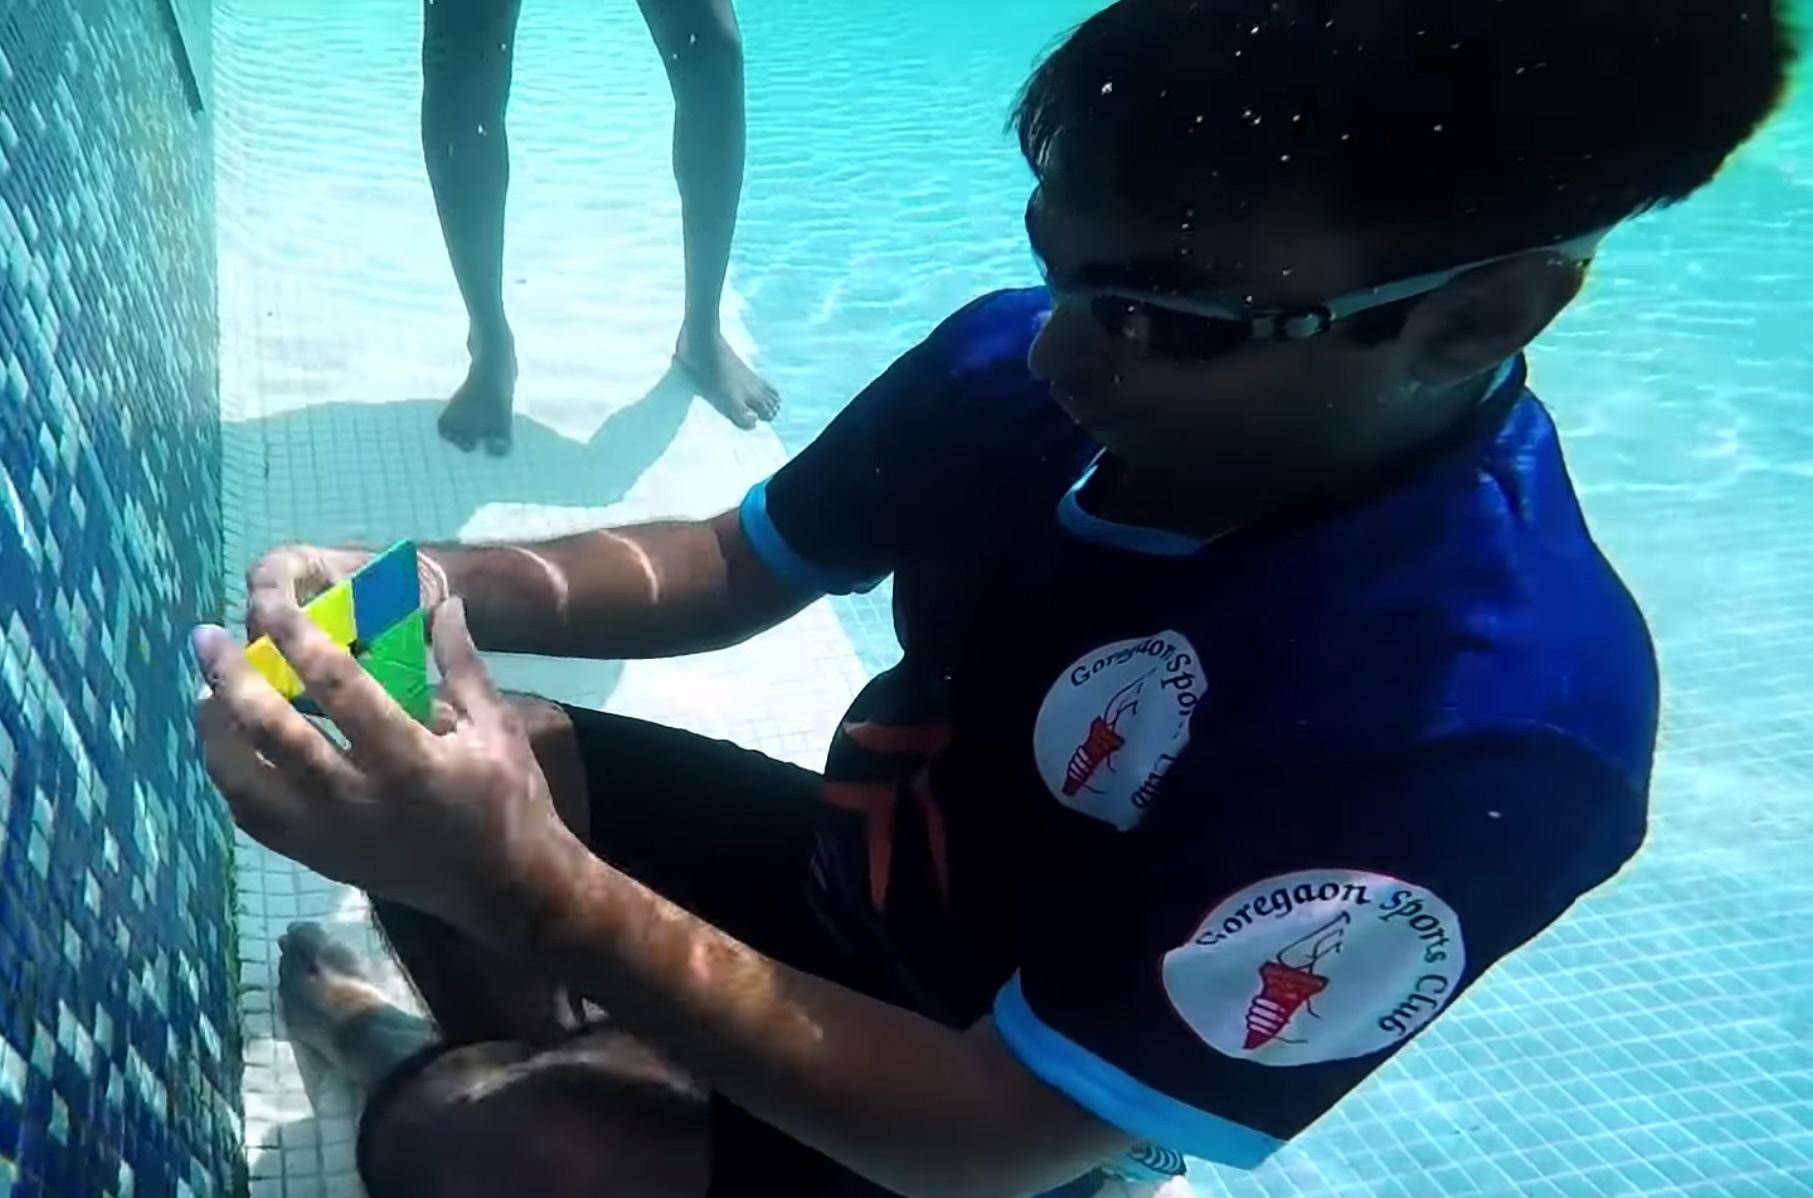 Pyraminx Rubik's Cube Record Underwater